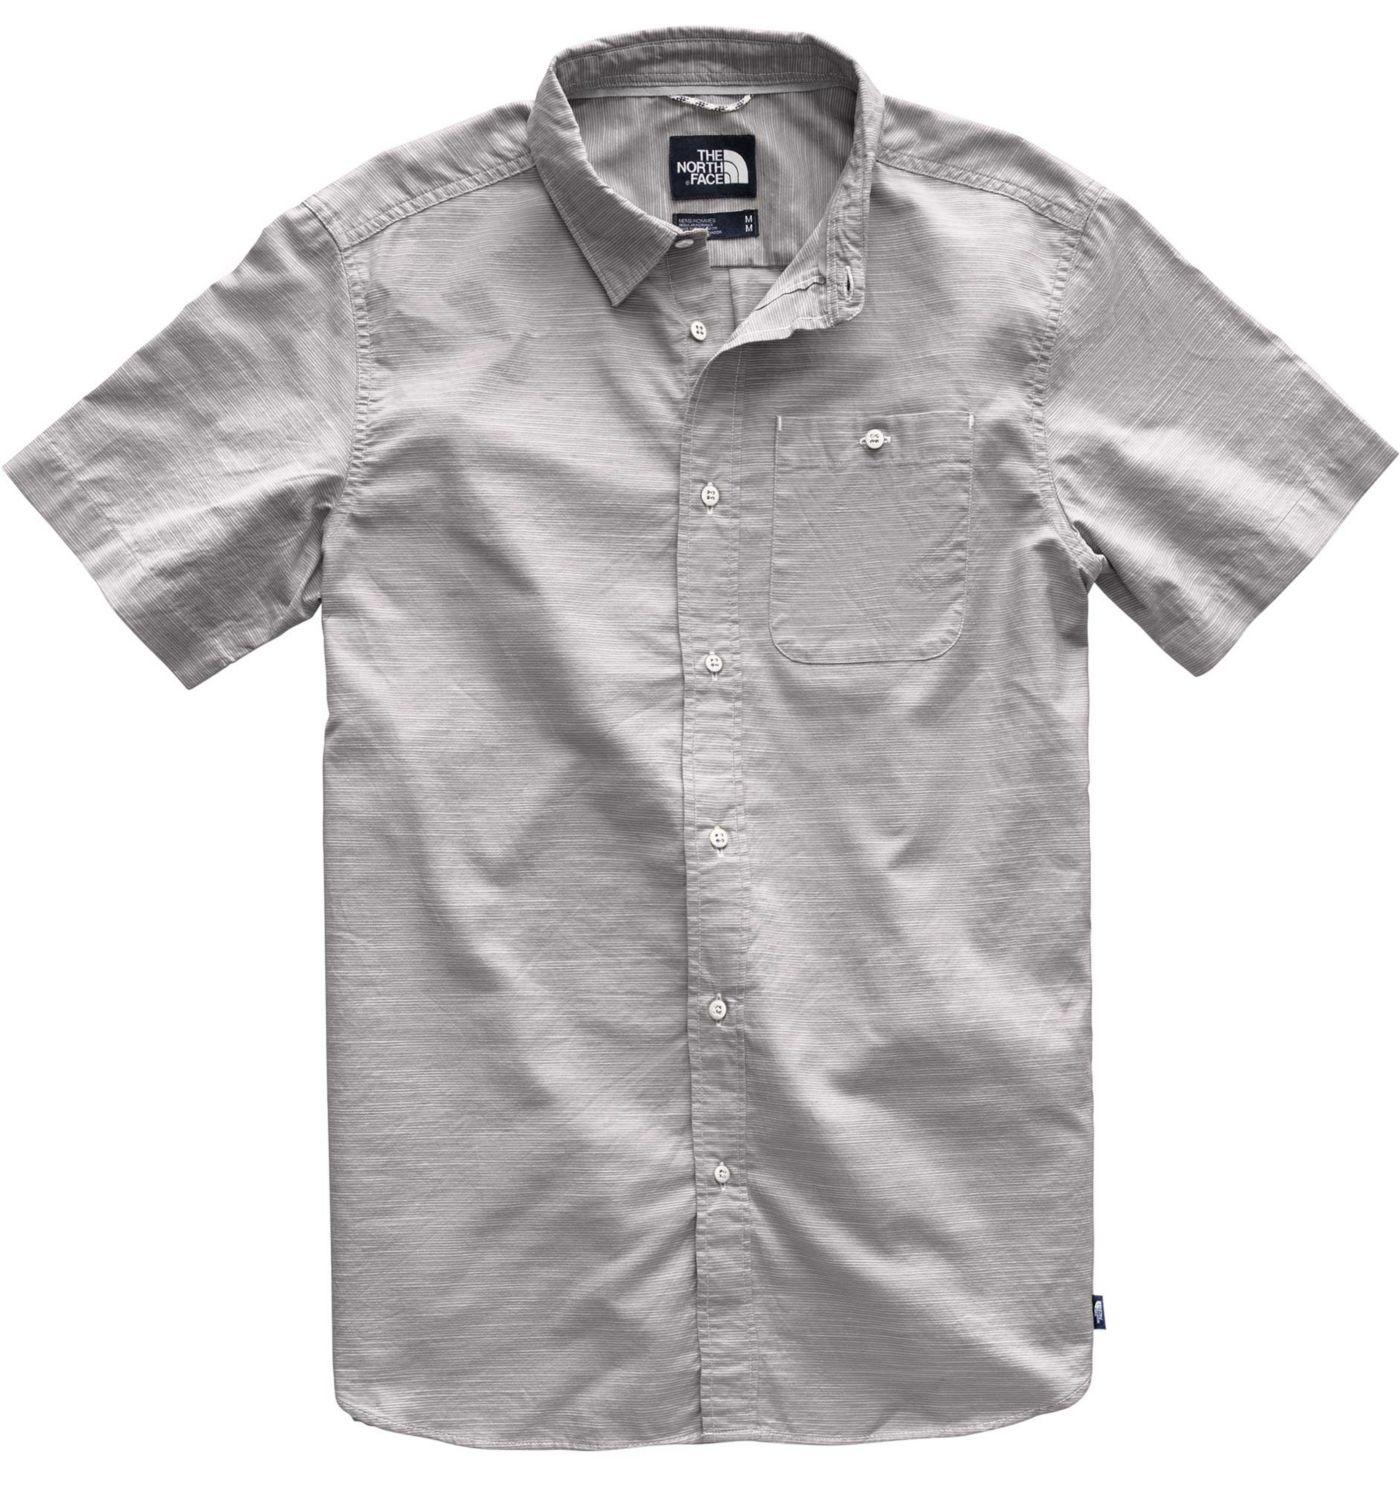 The North Face Men's Short Sleeve Buttonwood Shirt